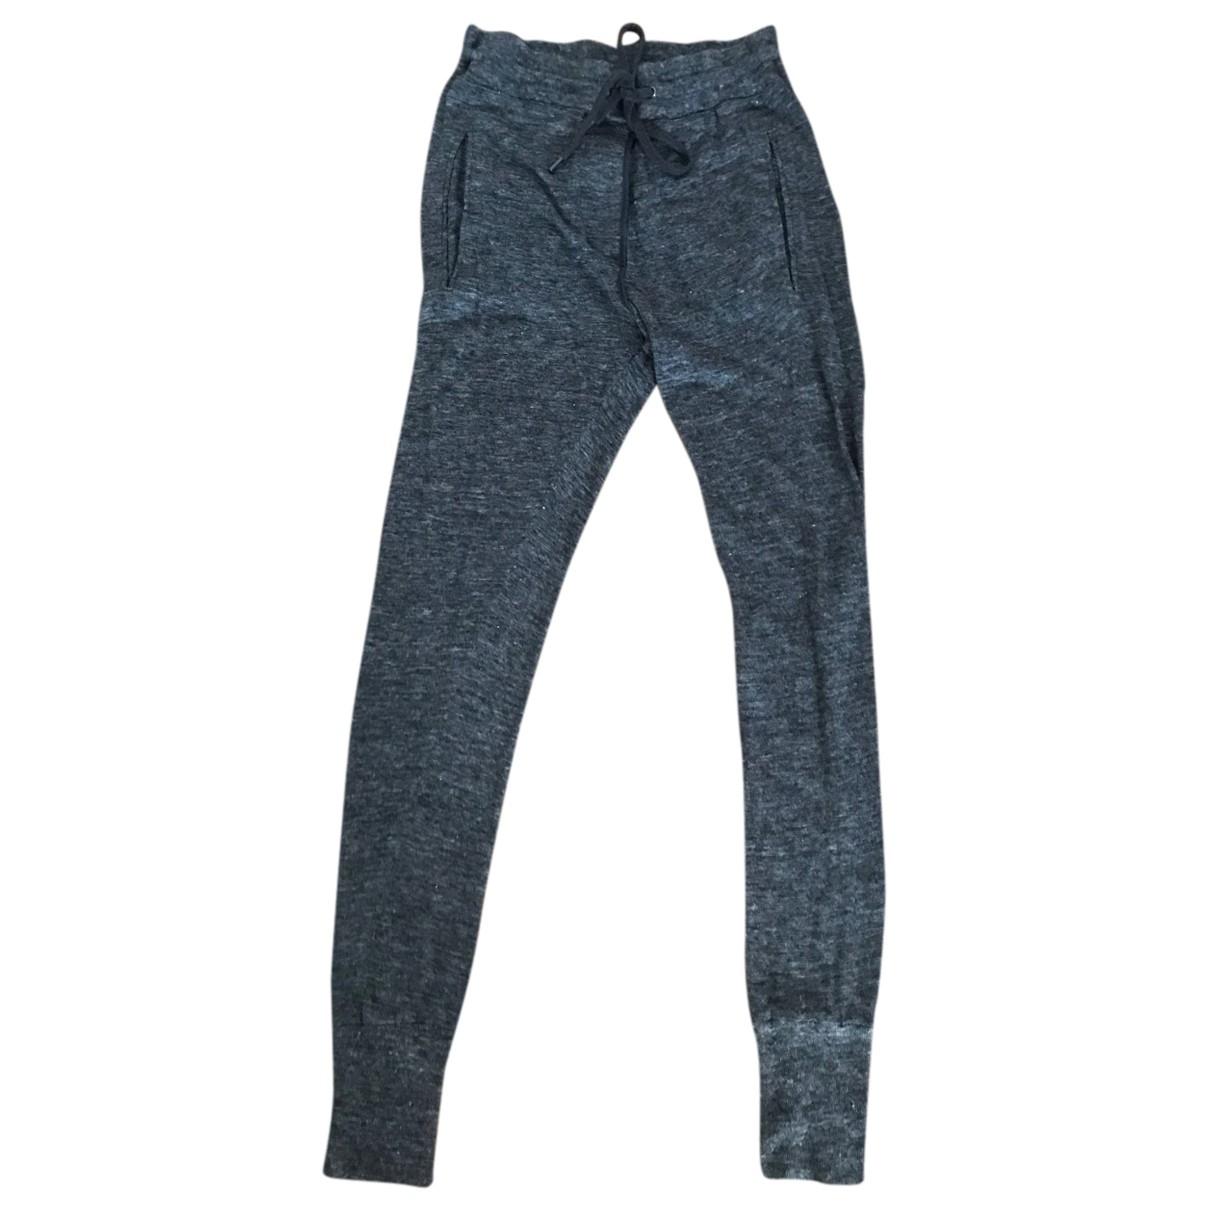 Isabel Marant Etoile \N Grey Linen Trousers for Women XS International